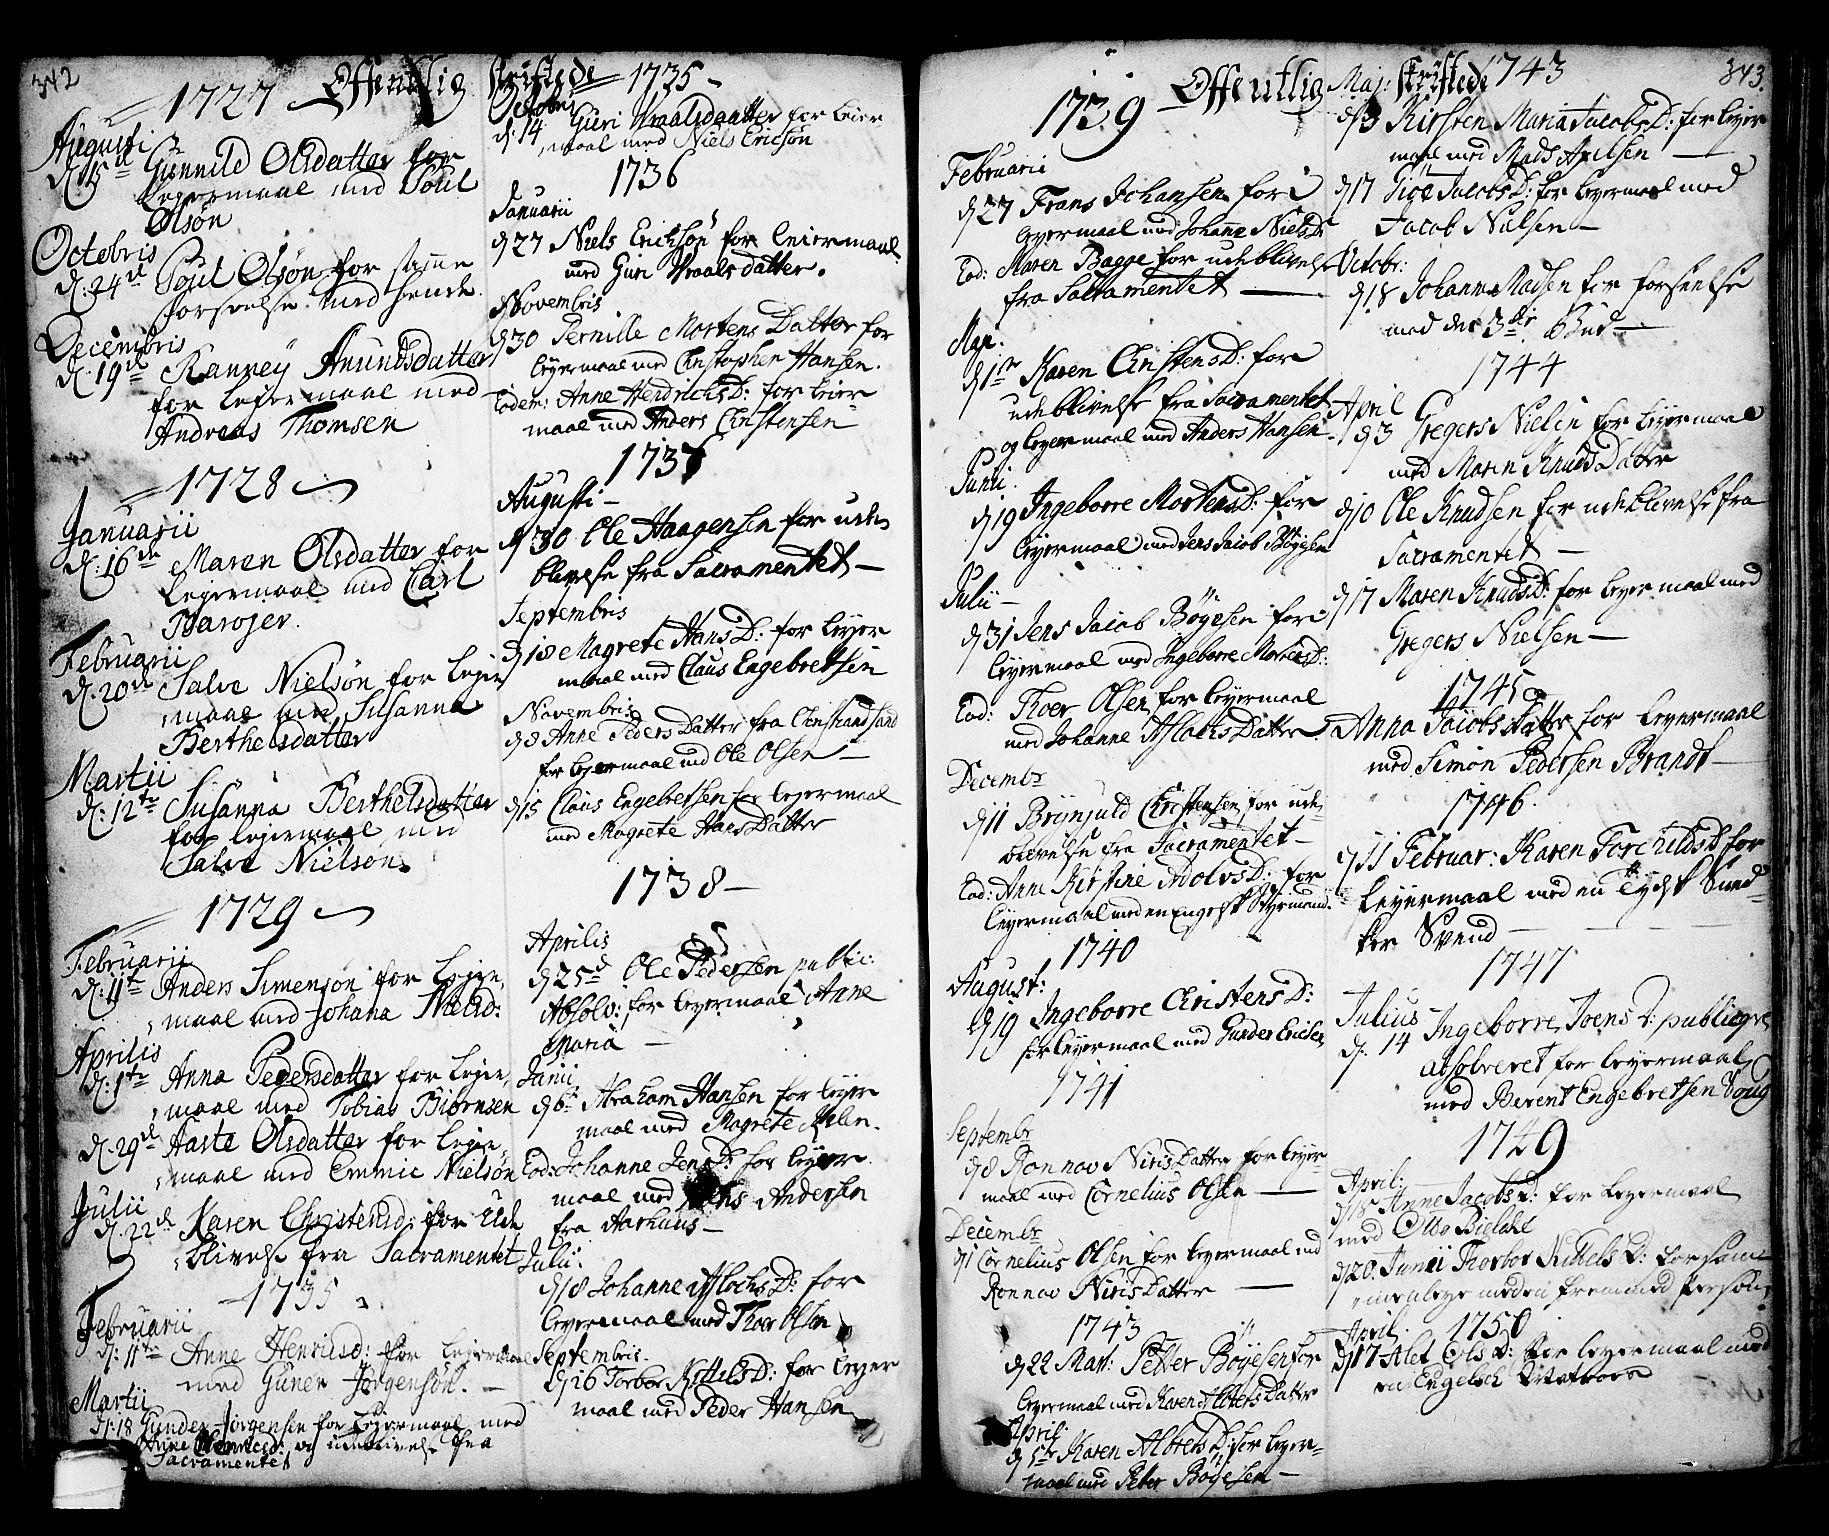 SAKO, Kragerø kirkebøker, F/Fa/L0001: Ministerialbok nr. 1, 1702-1766, s. 342-343